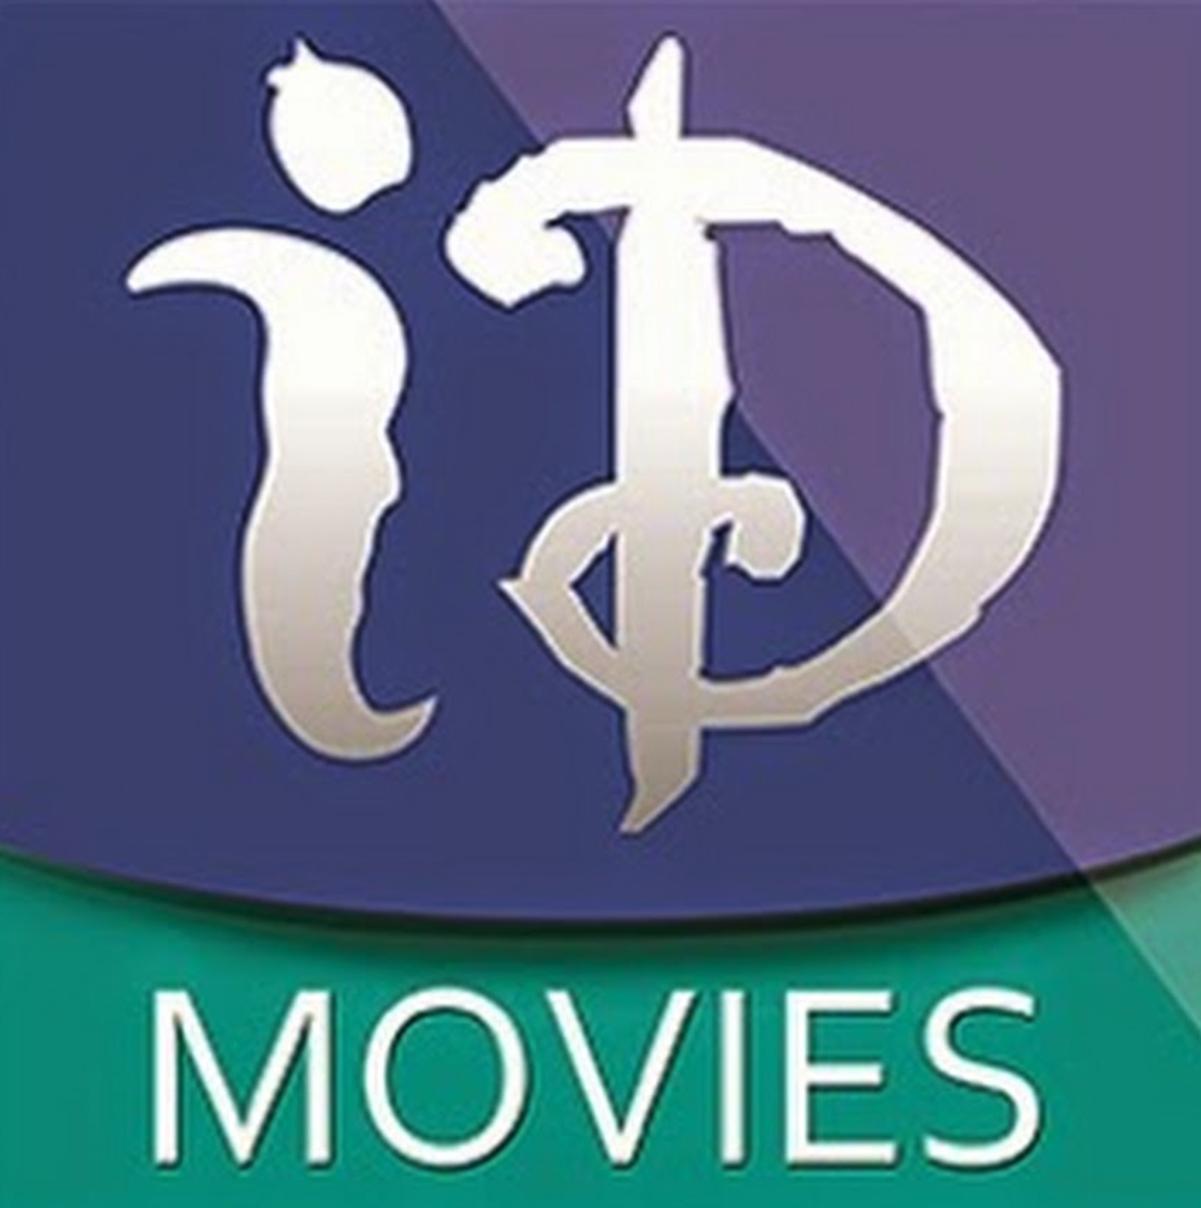 iDream Telugu Movies wiki, iDream Telugu Movies history, iDream Telugu Movies news